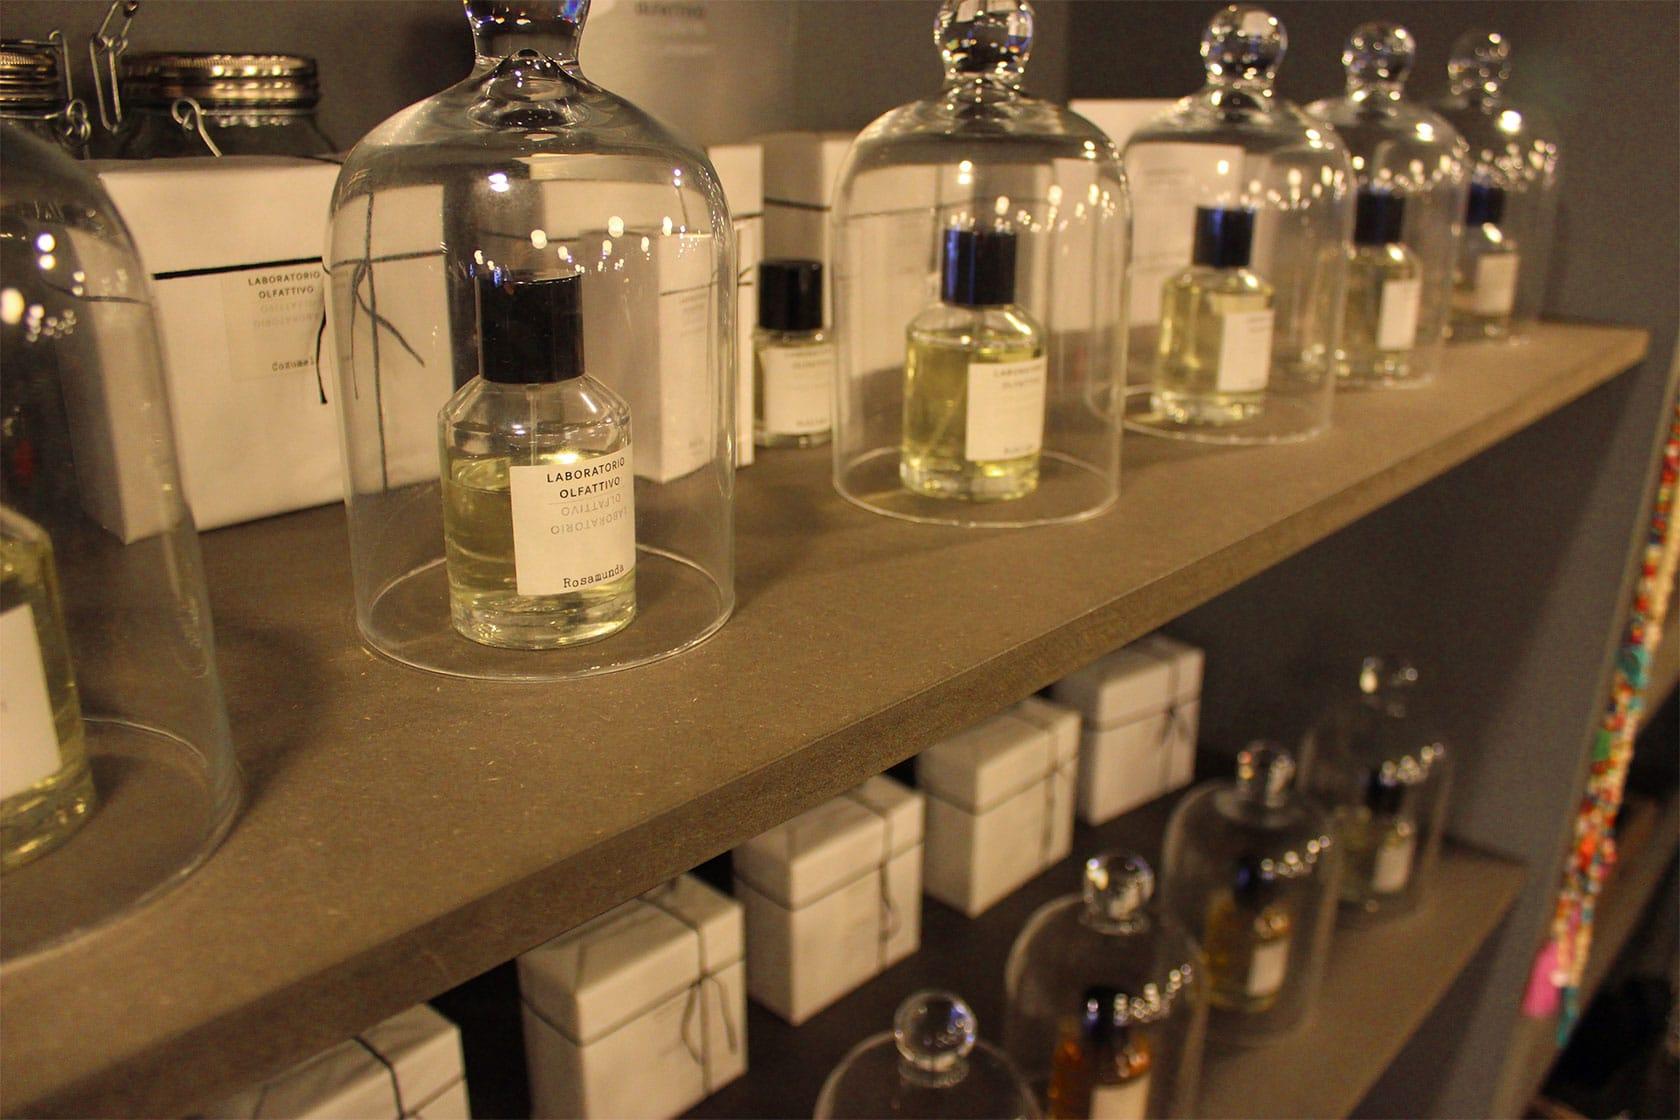 Laboratorio Olfattivo Parfum